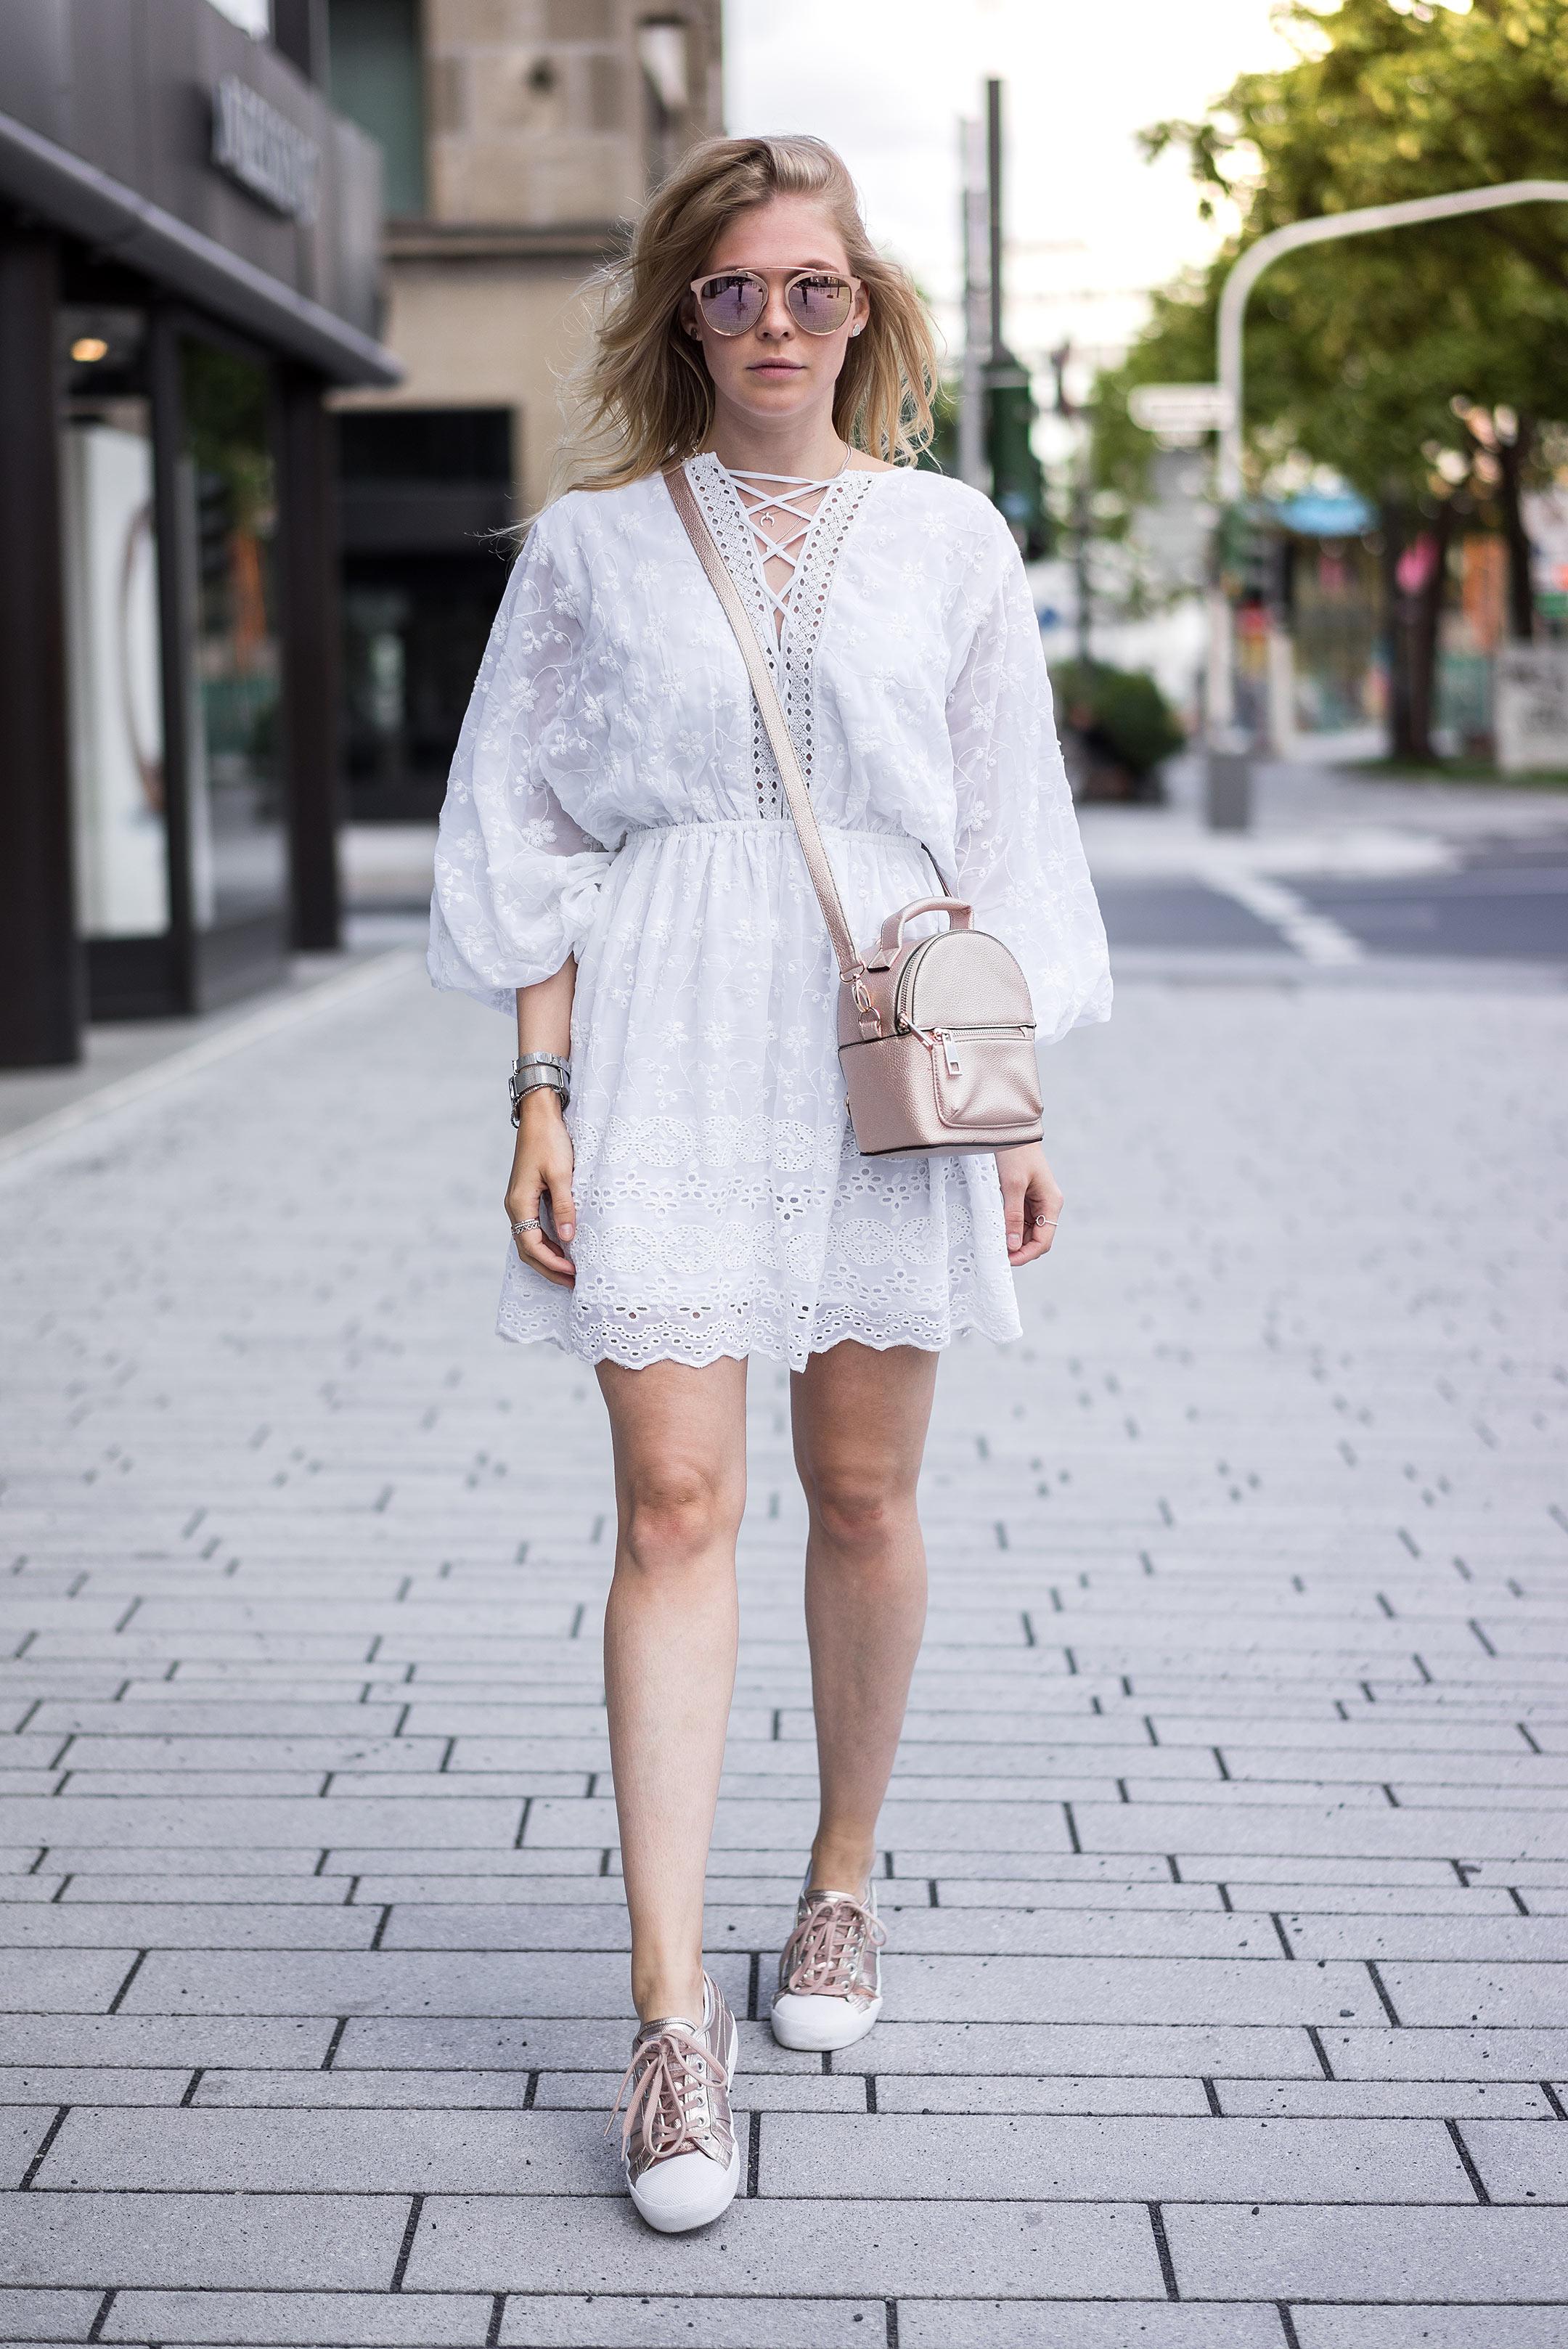 Spitzenkleid weiss Outfit Rucksack Gola Sneaker rose gold Sunnyinga Blog